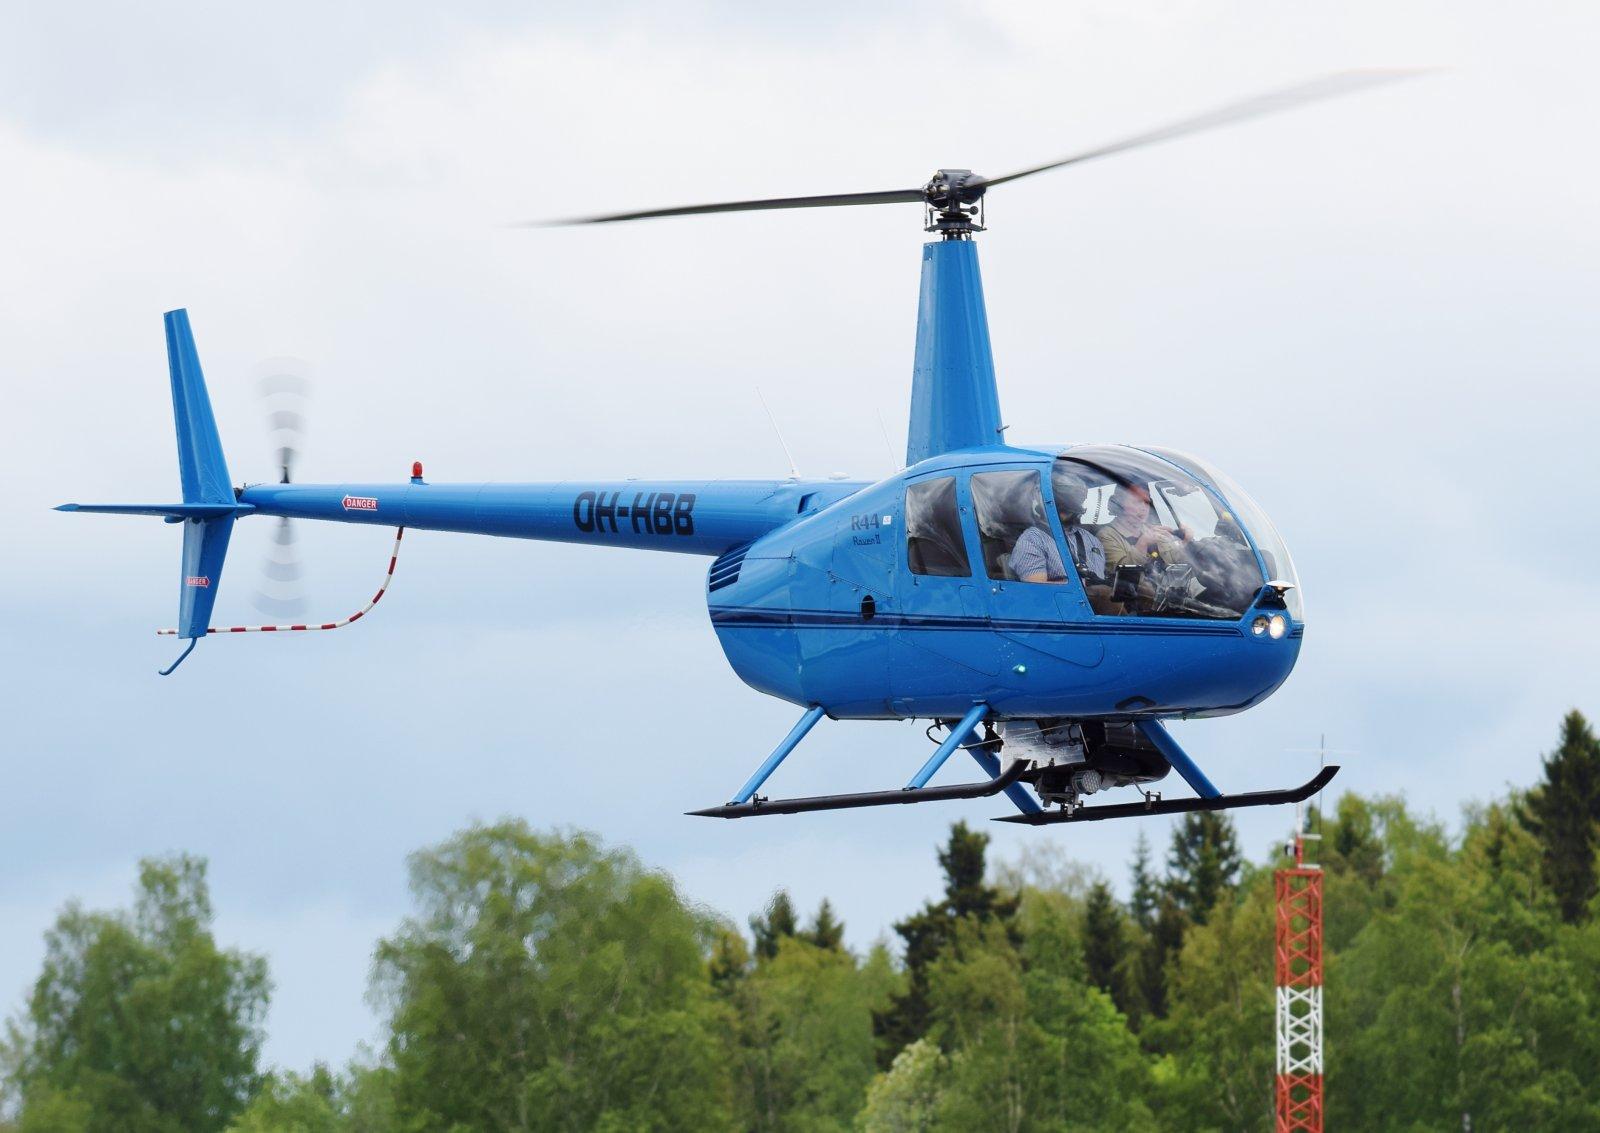 OH-HBB - Robinson R44 Raven II - Heliwest Oy - 28.5.2019